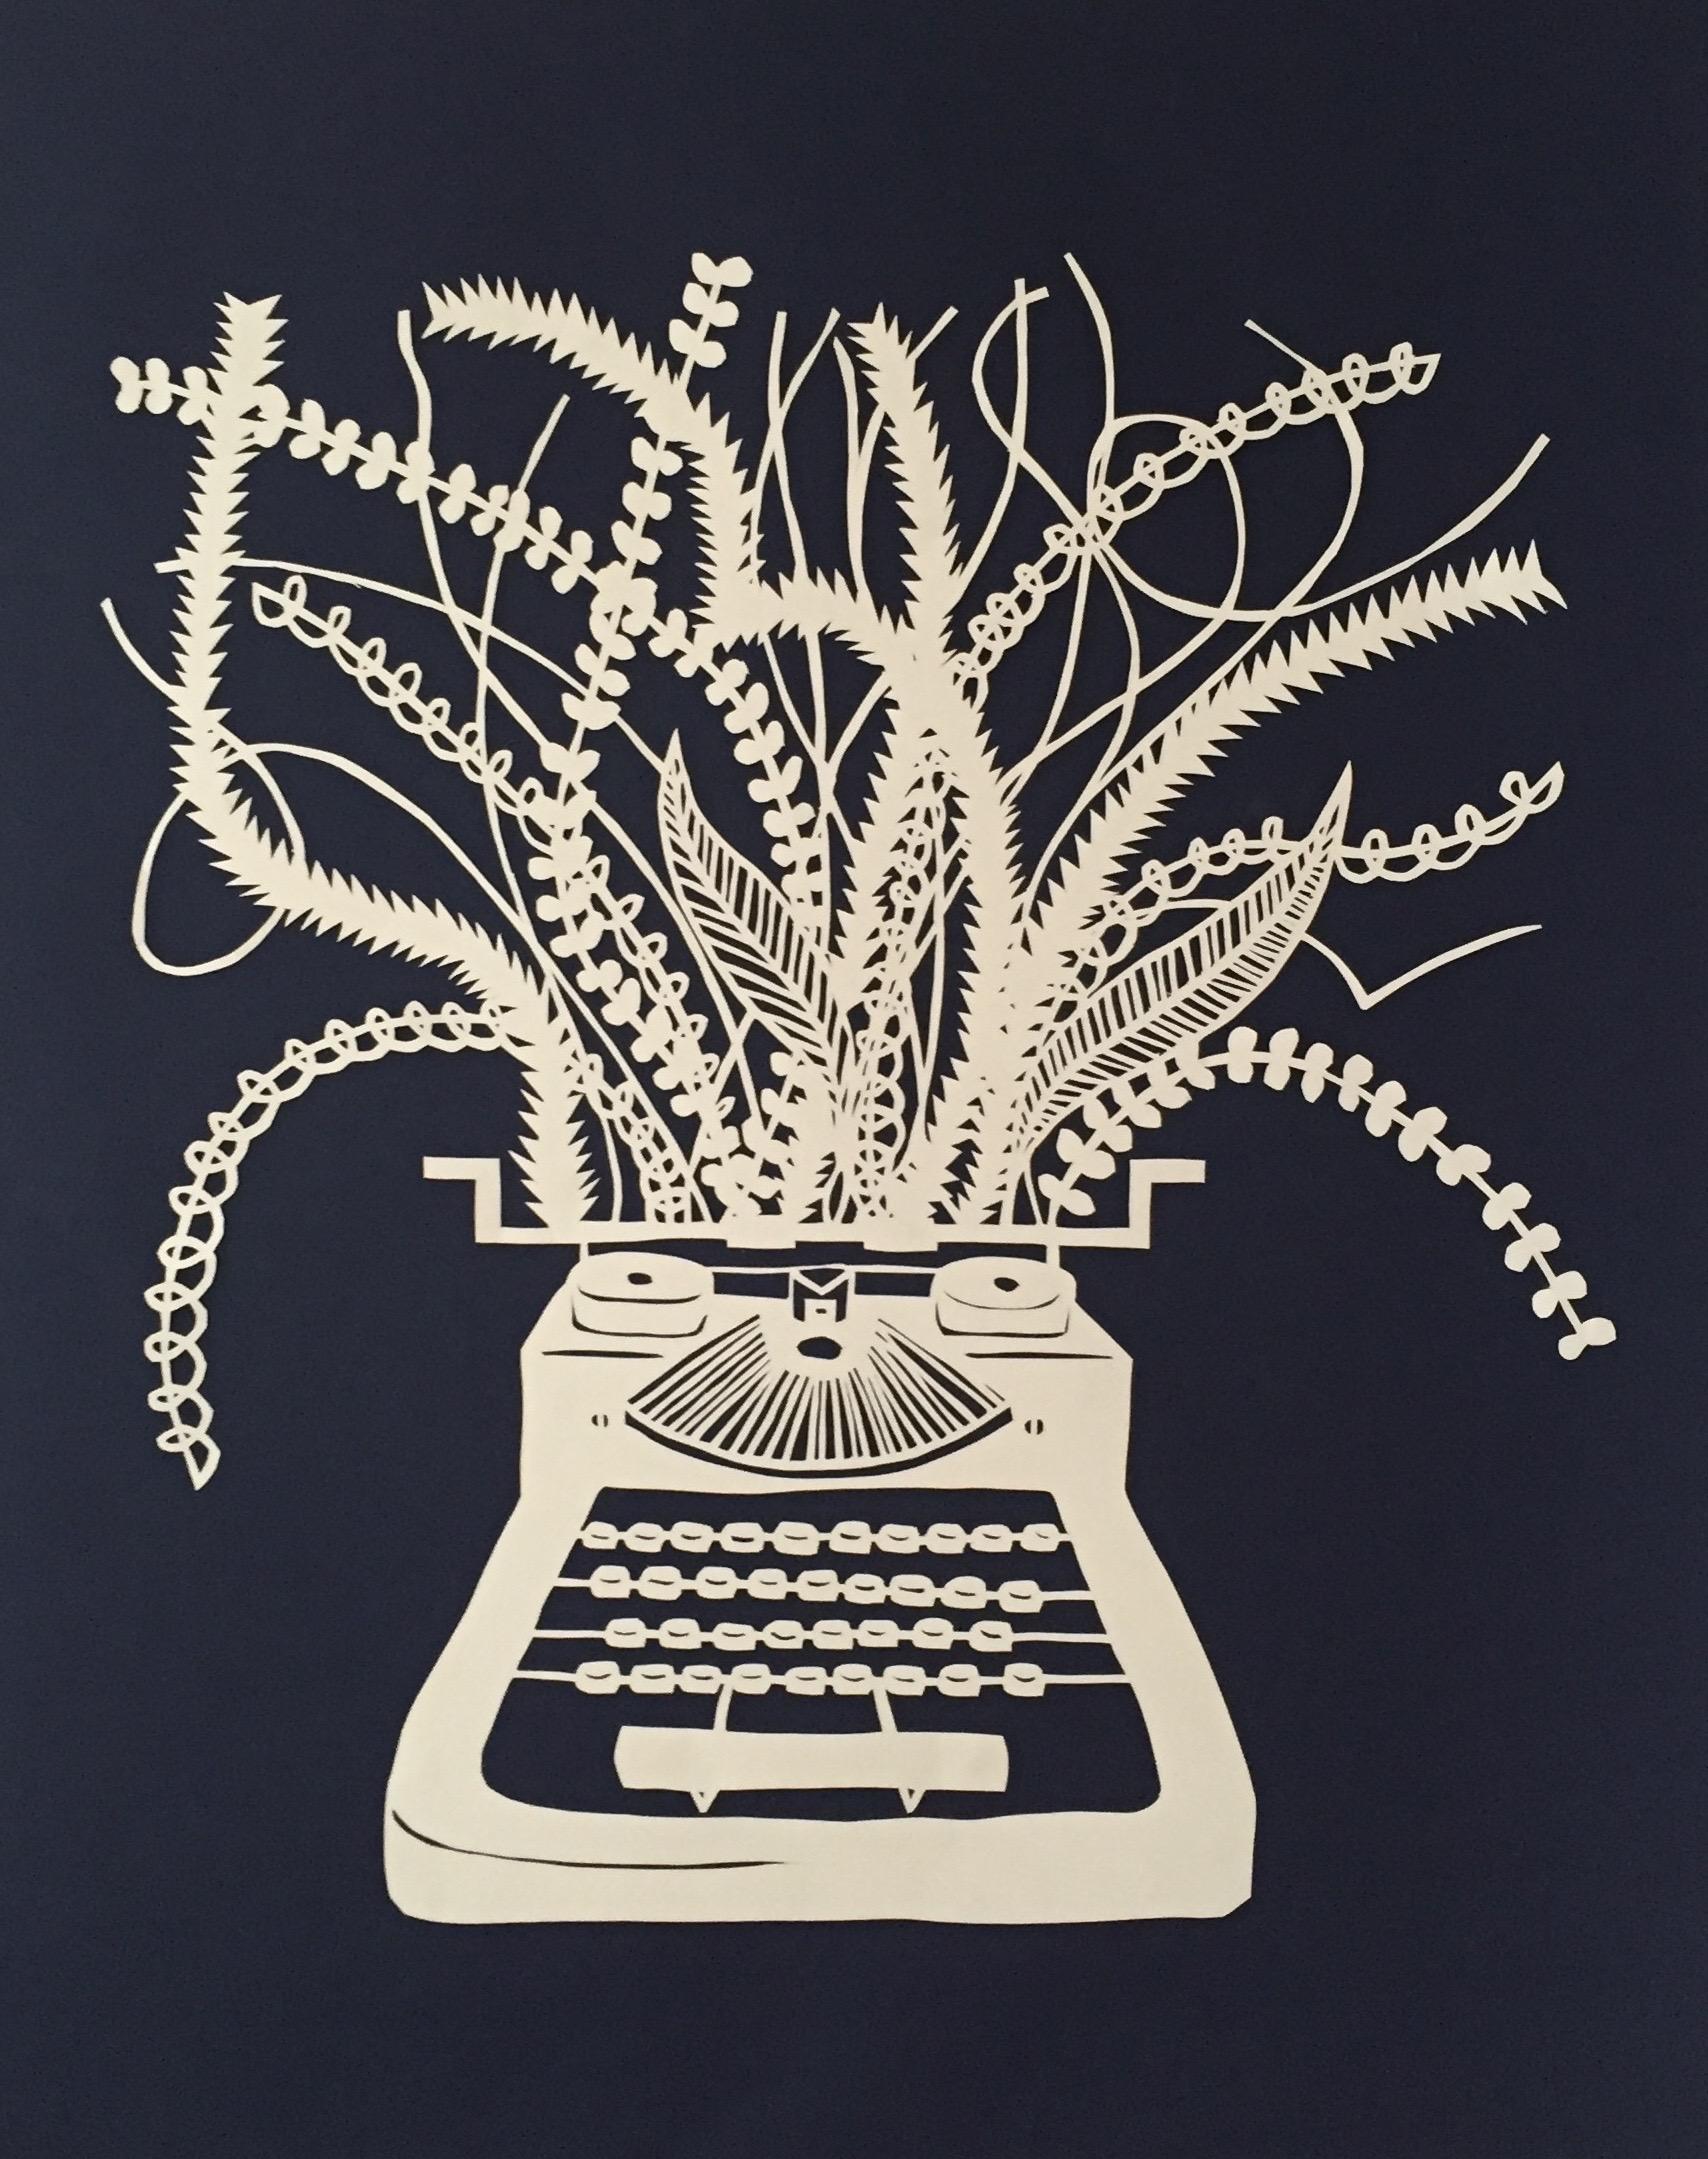 Papercut by Kady MacFarlane.